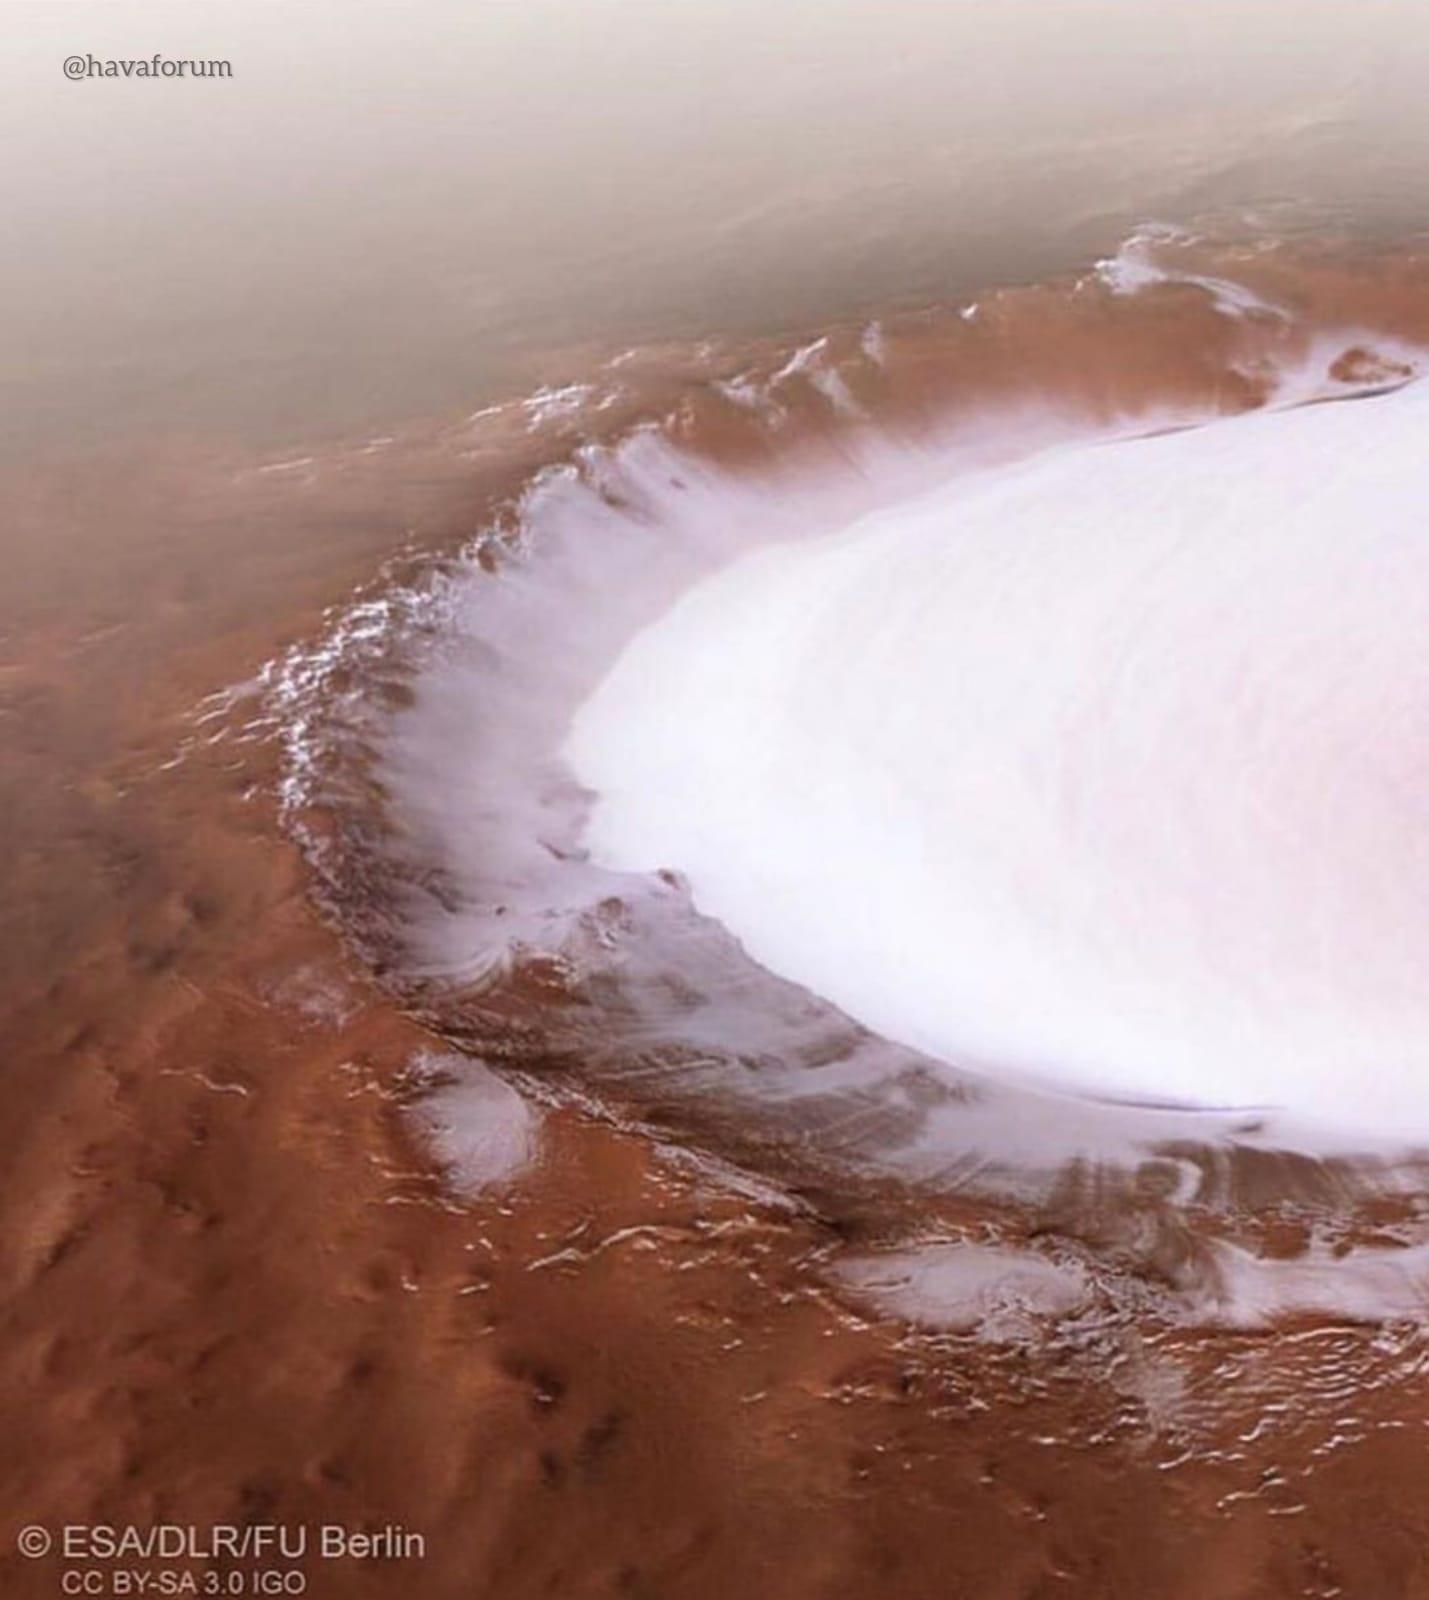 11 Mars'taki İnanılmaz Su Deposu! Haberler